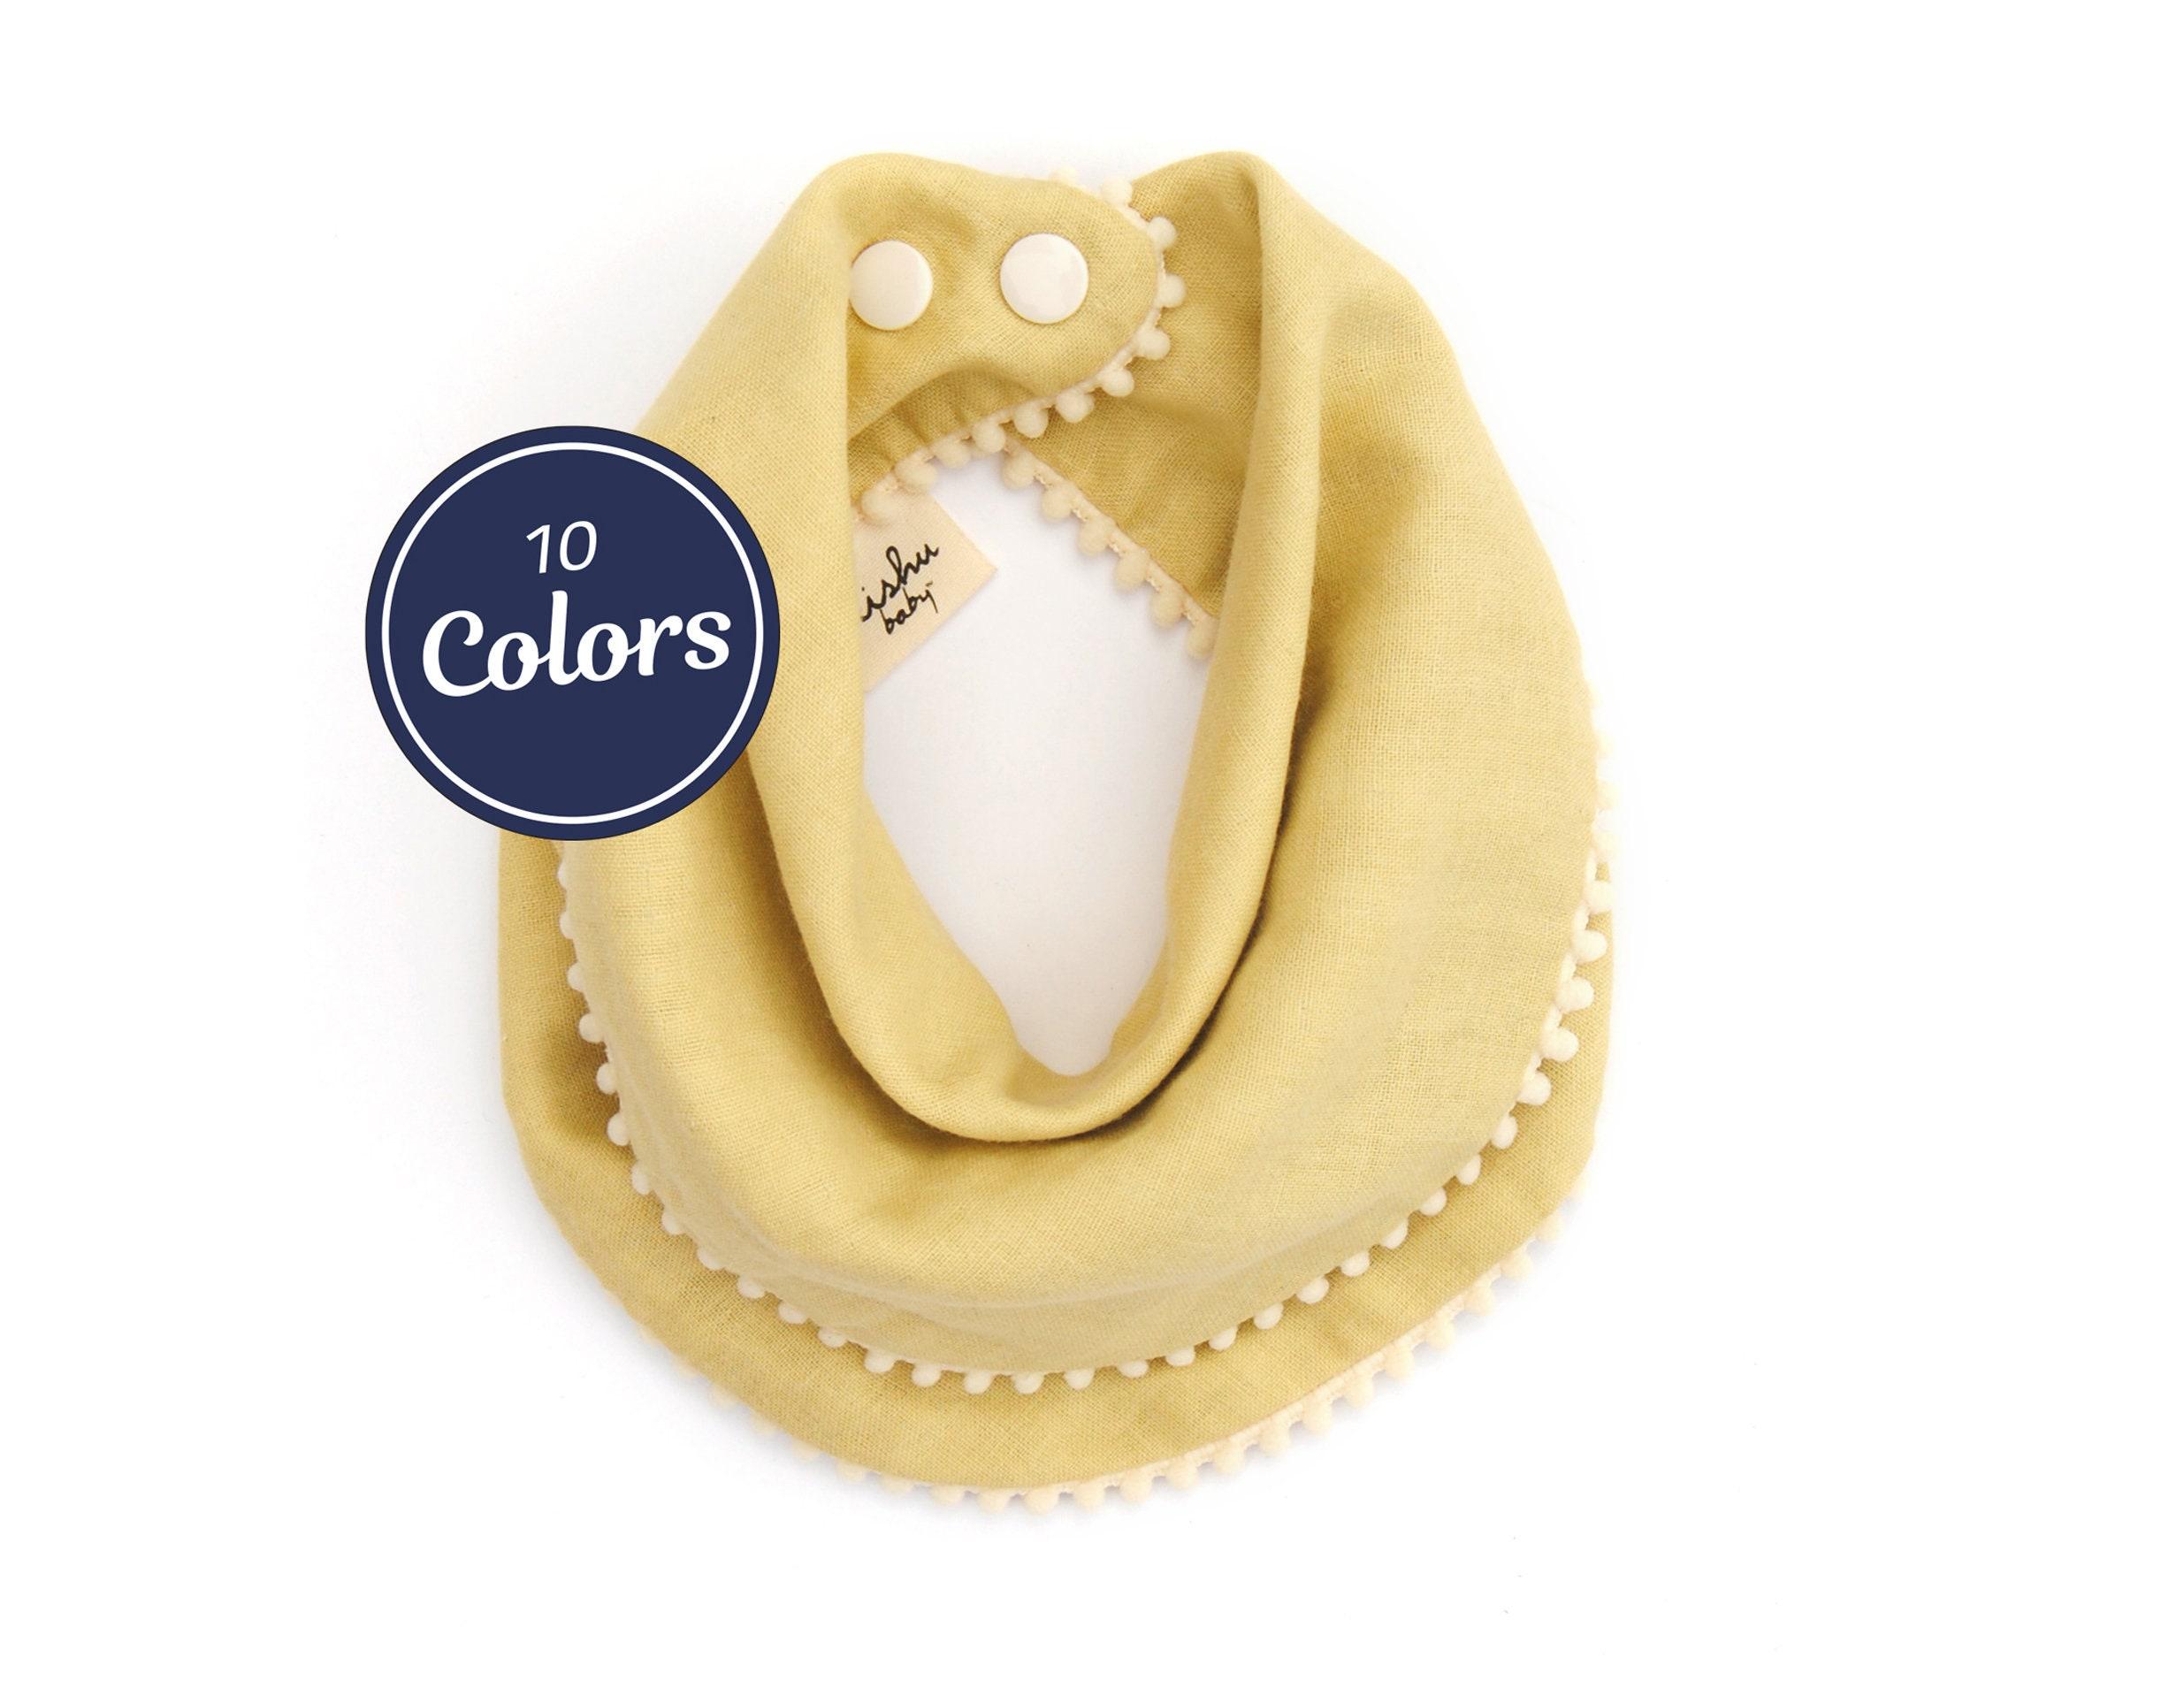 Solid color reversible drool bib